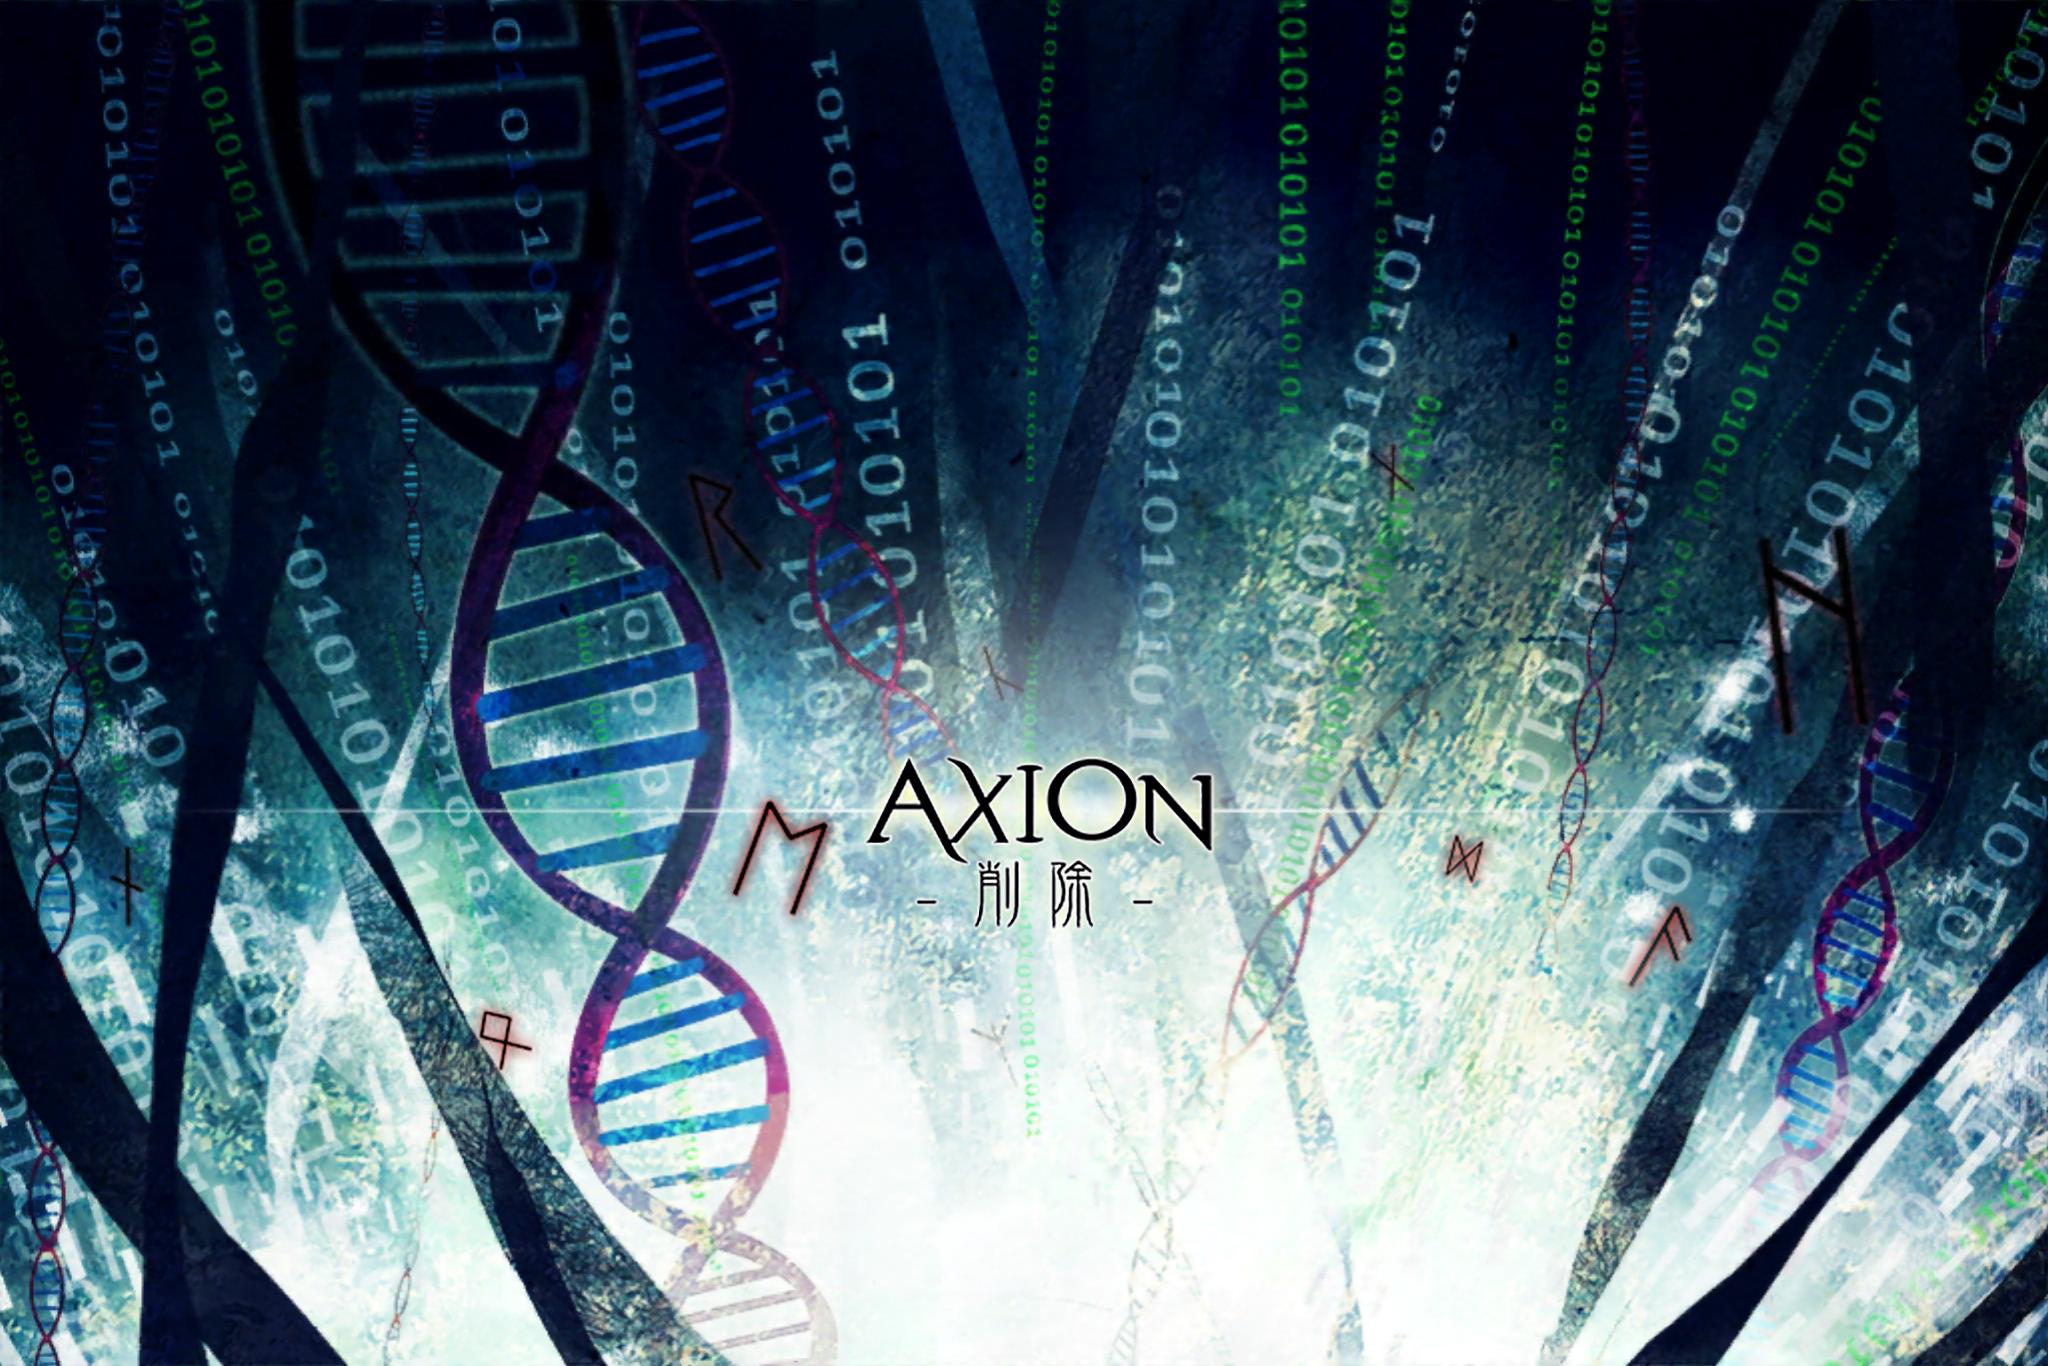 AXION (Cytus)